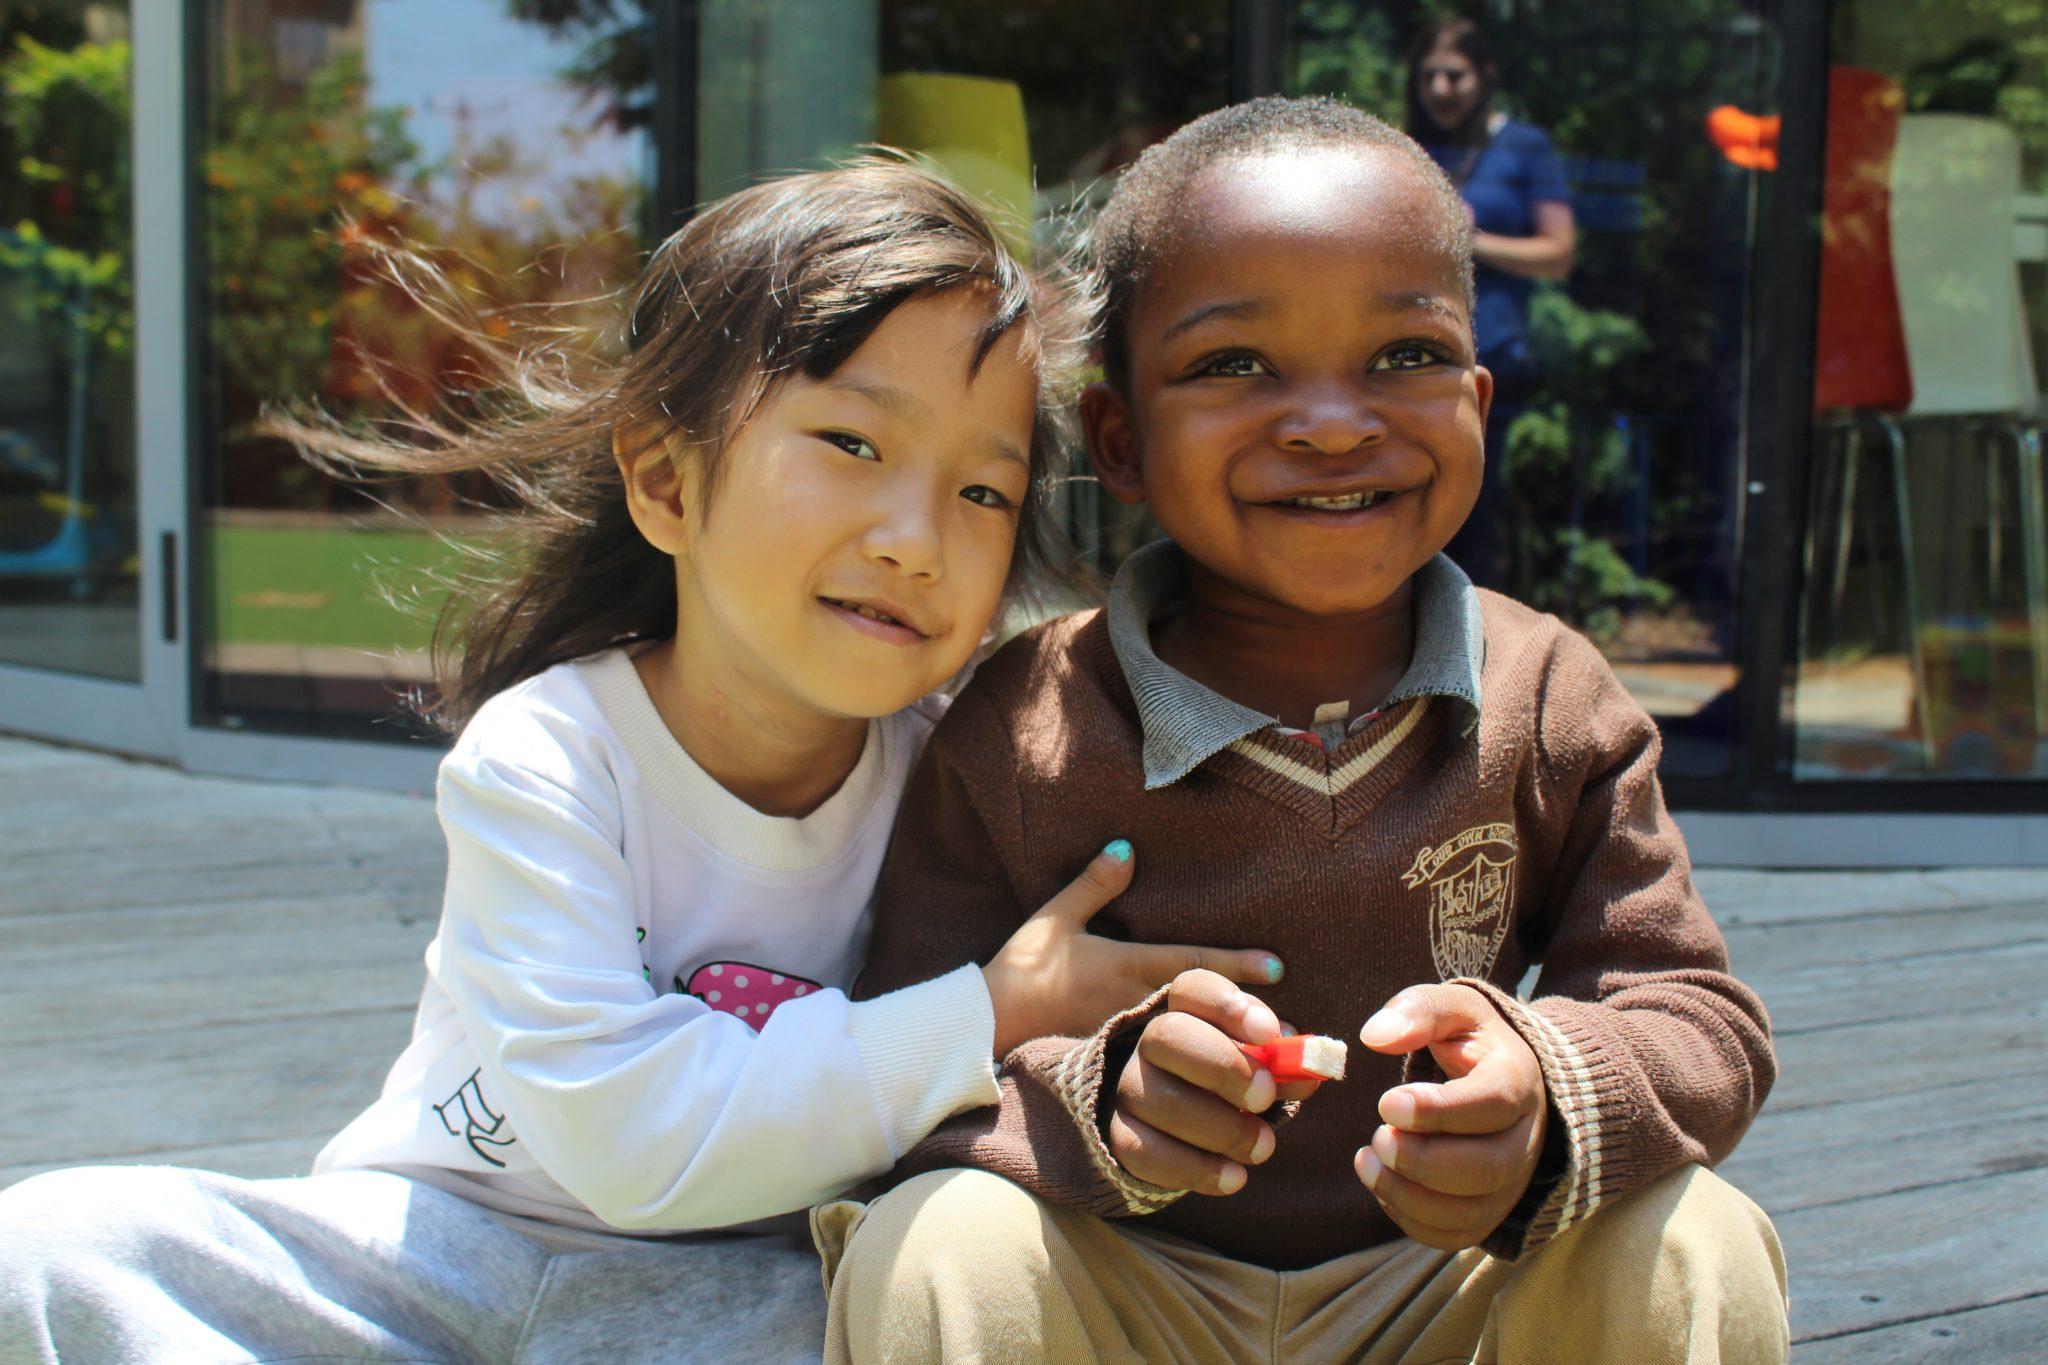 Israeli nonprofit Save a Child's Heart wins UN award | ISRAEL21c